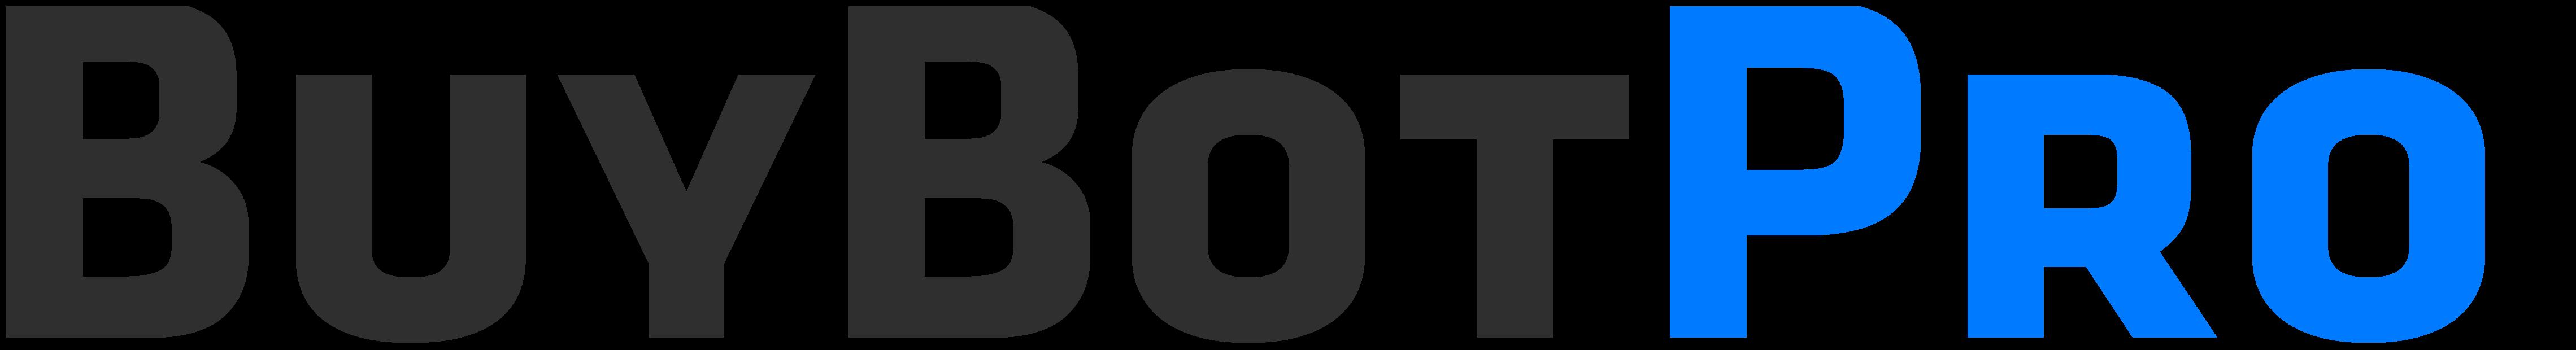 BuyBotPro: Automate Your Online Arbitrage Deal Analysis